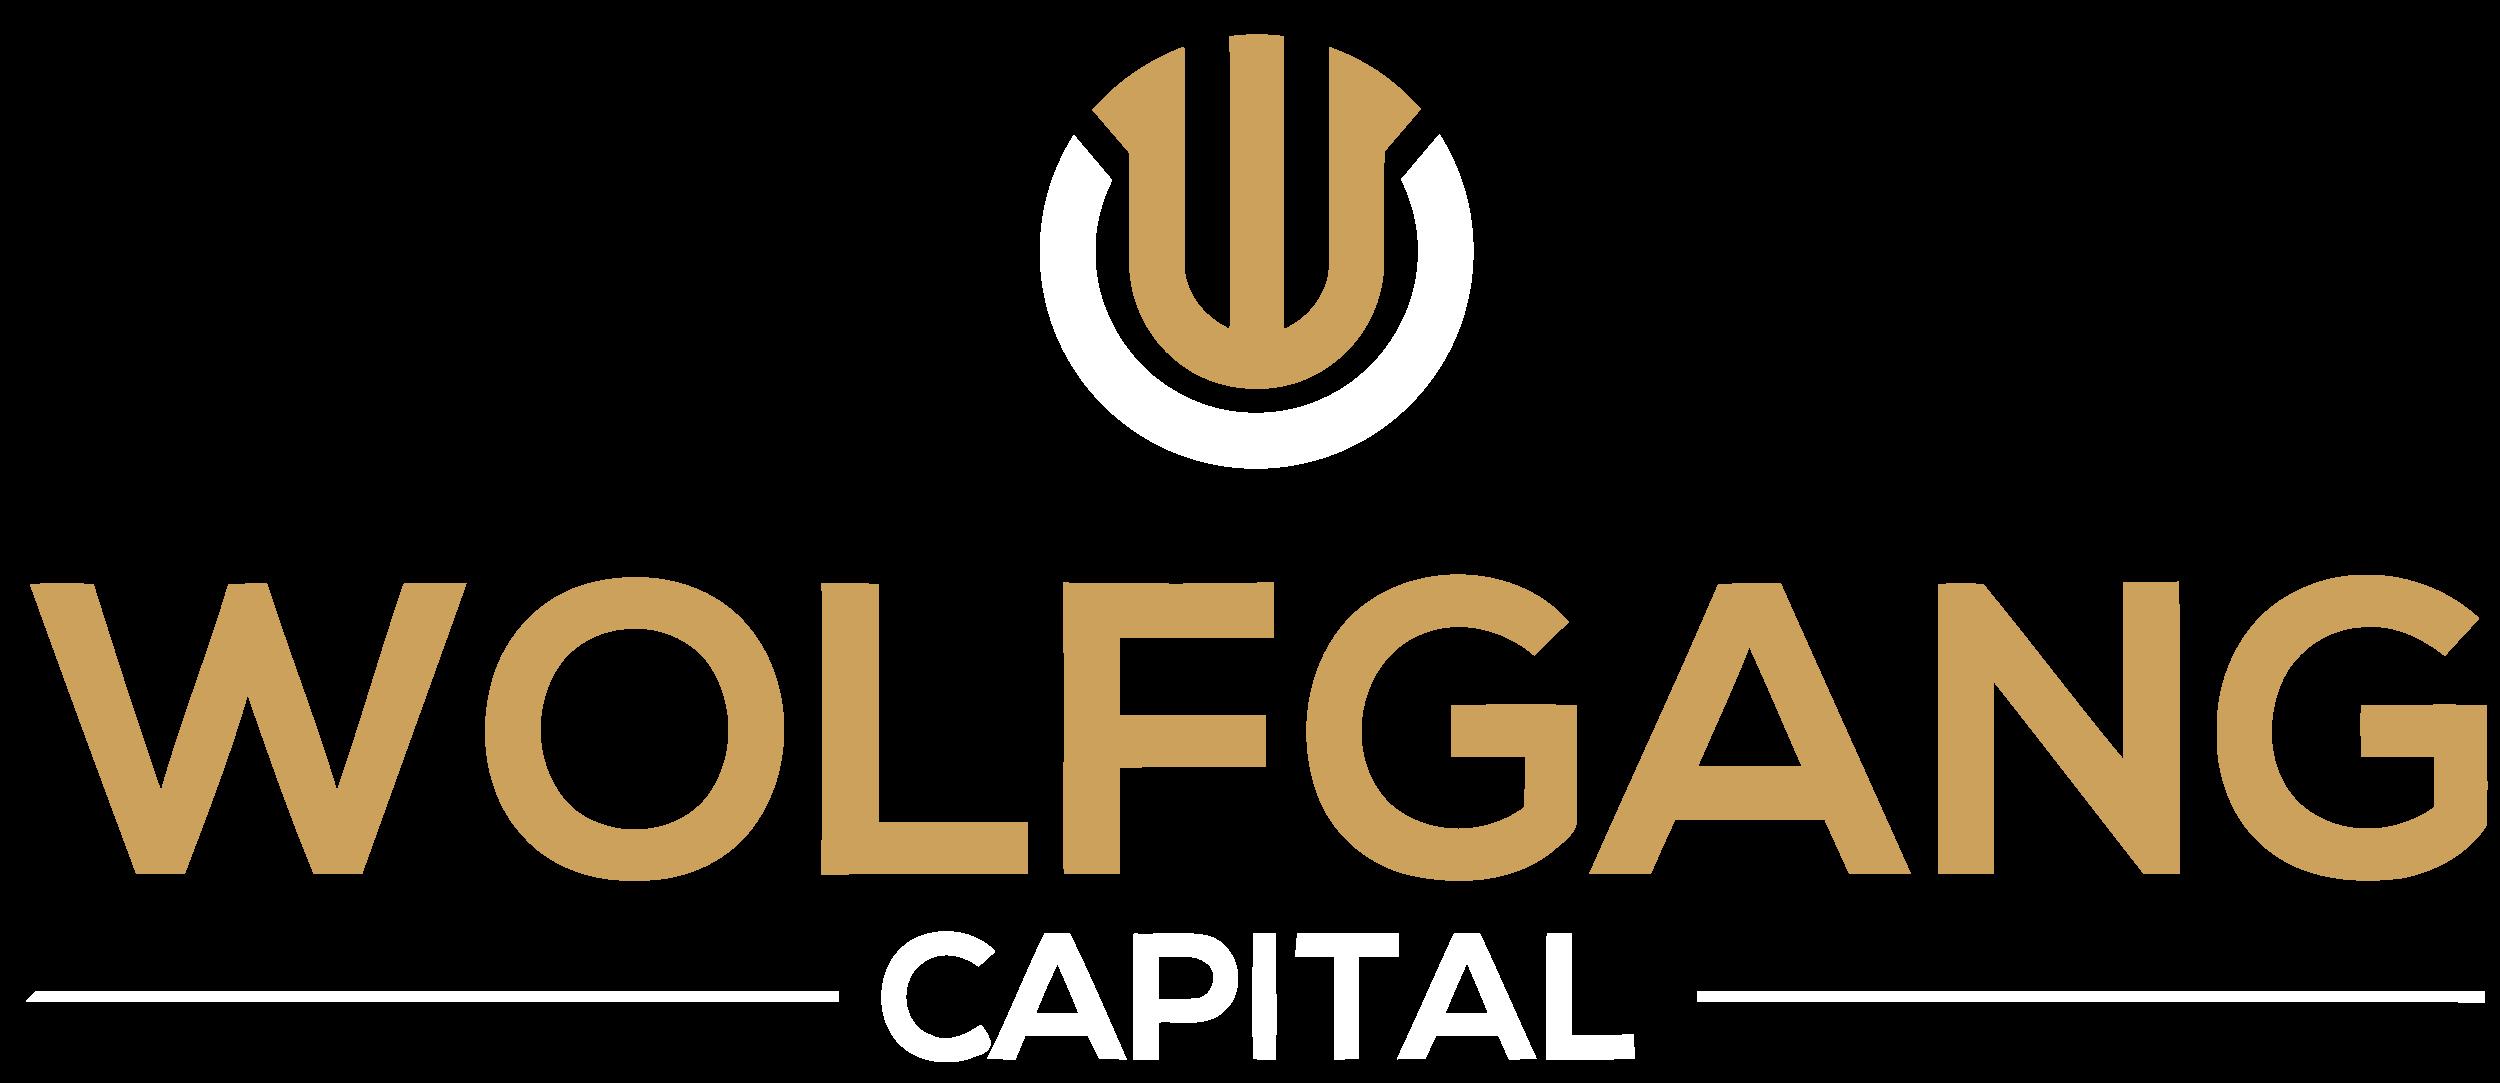 Wolfgang Capital